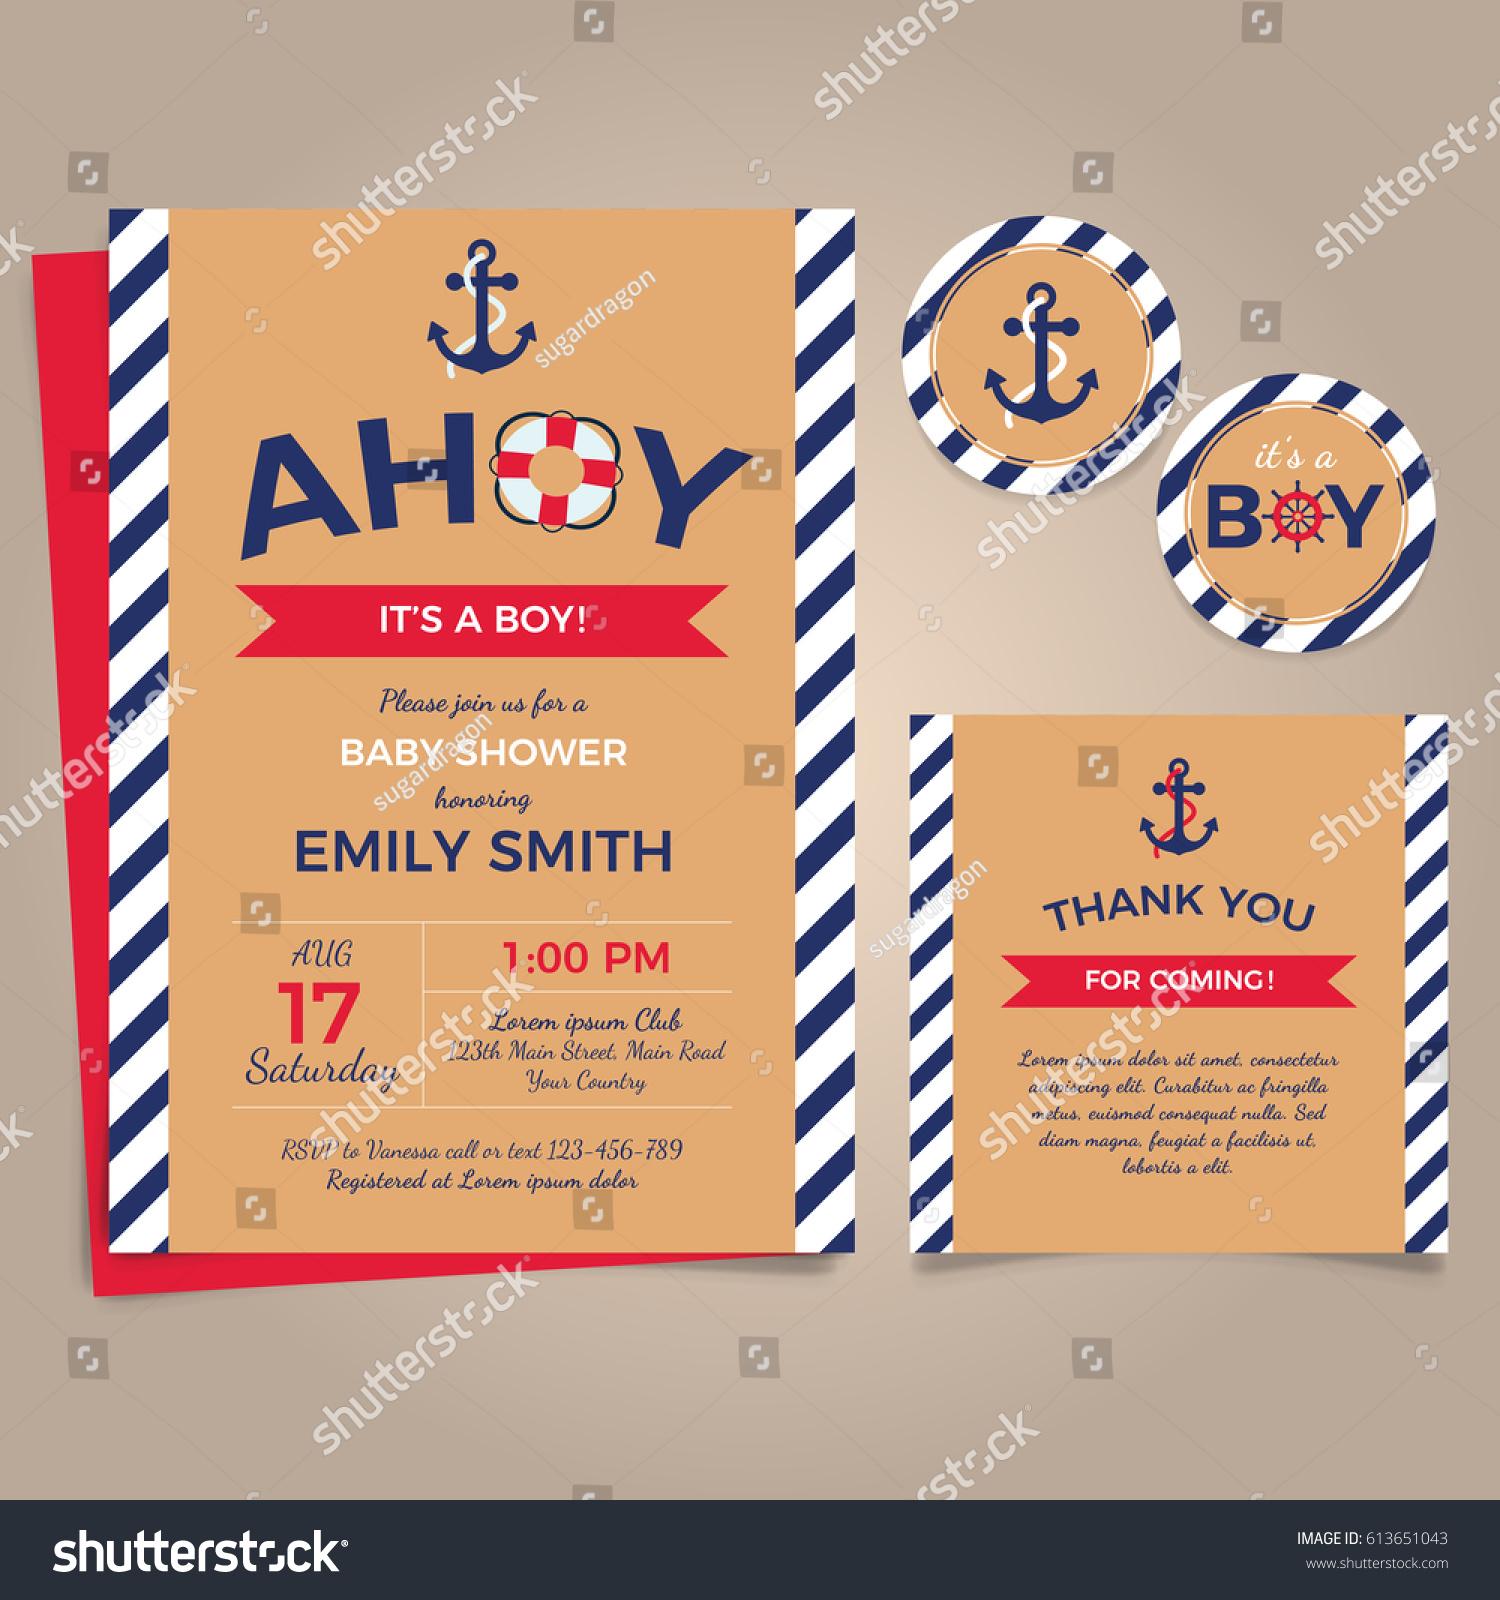 Nautical Birthday Invitation Design Template Stock Vector ...